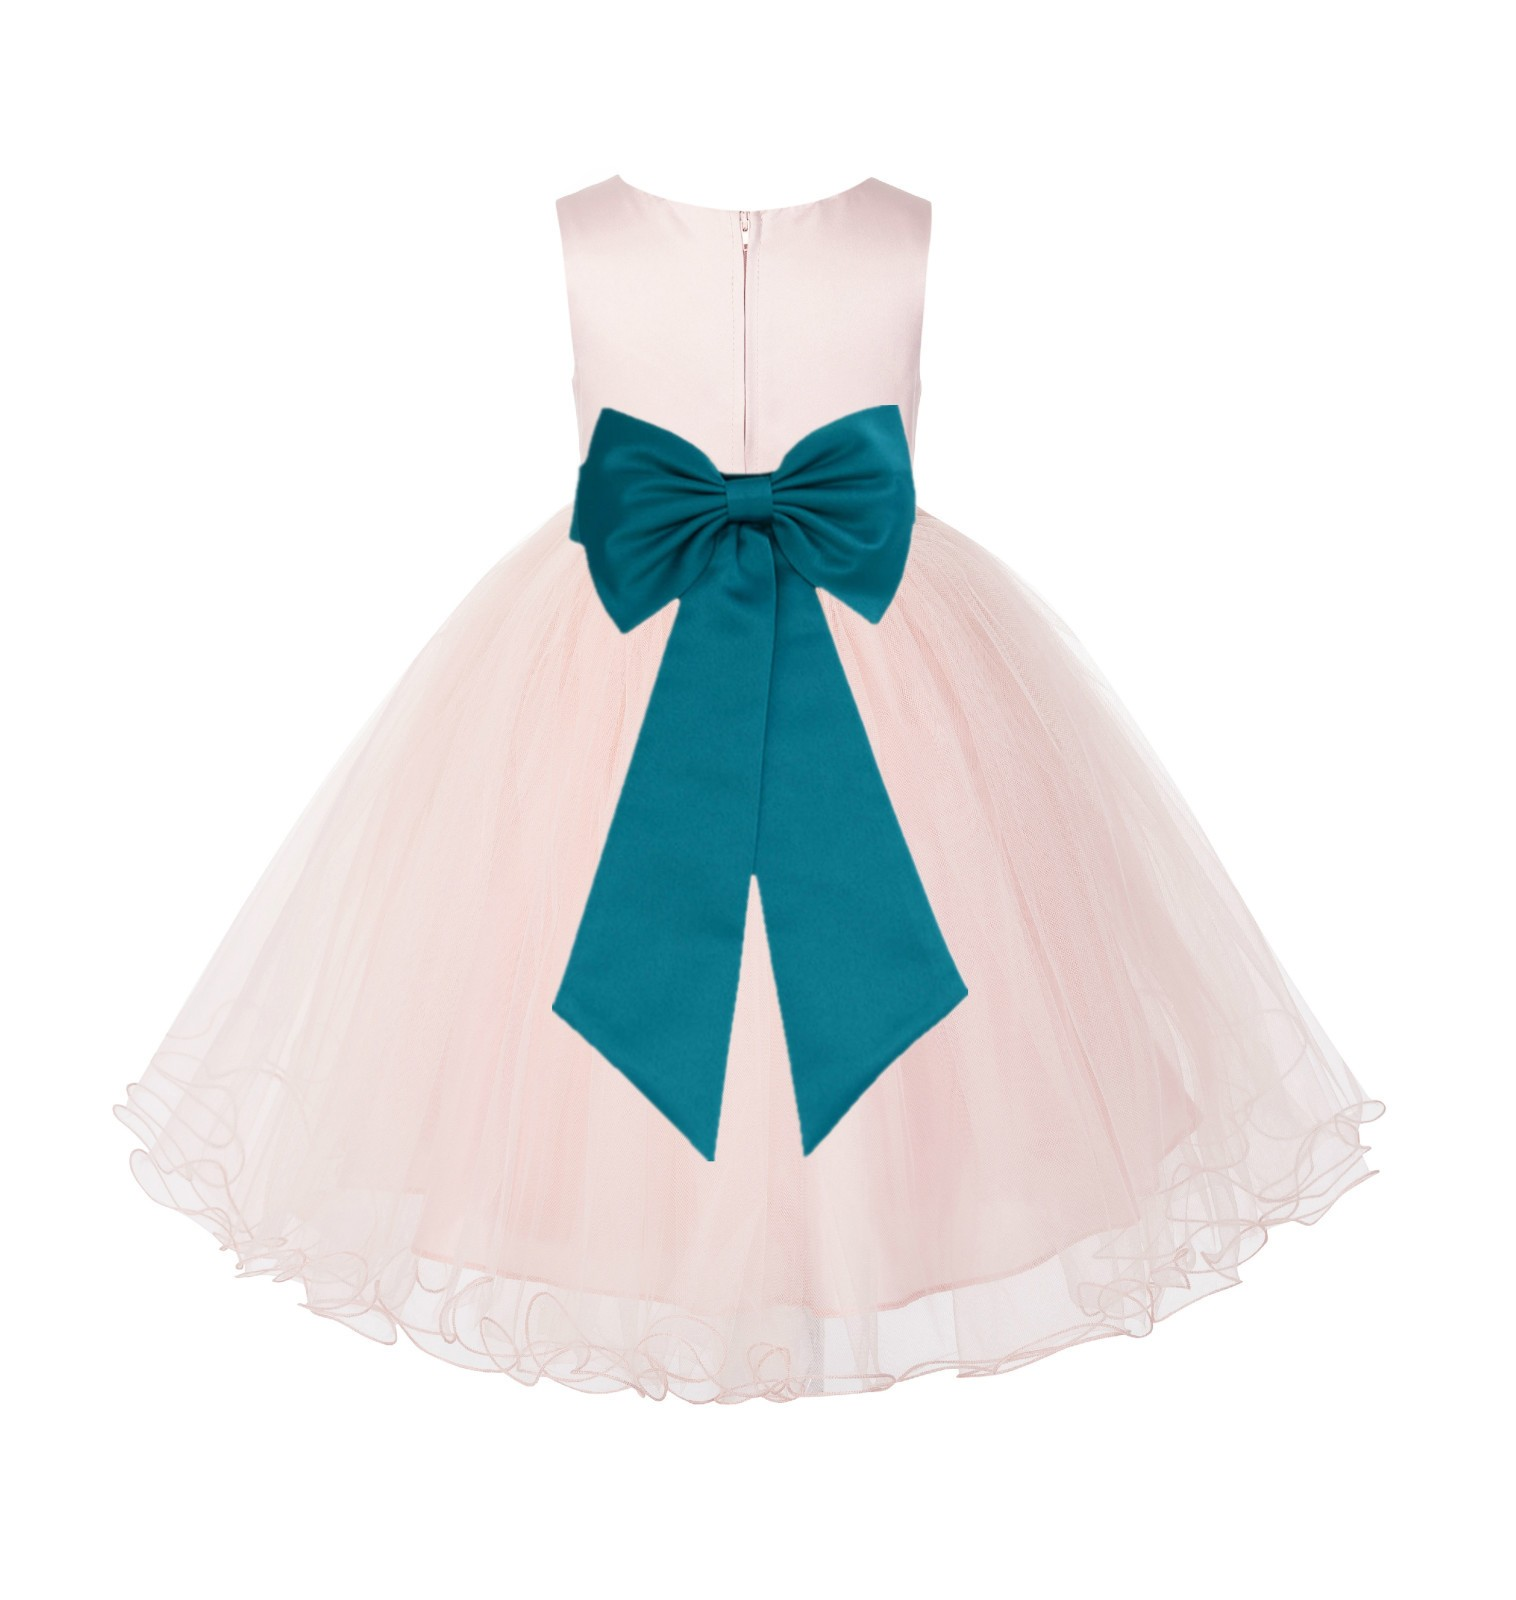 Blush PInk / Oasis Tulle Rattail Edge Flower Girl Dress Wedding Bridesmaid 829T